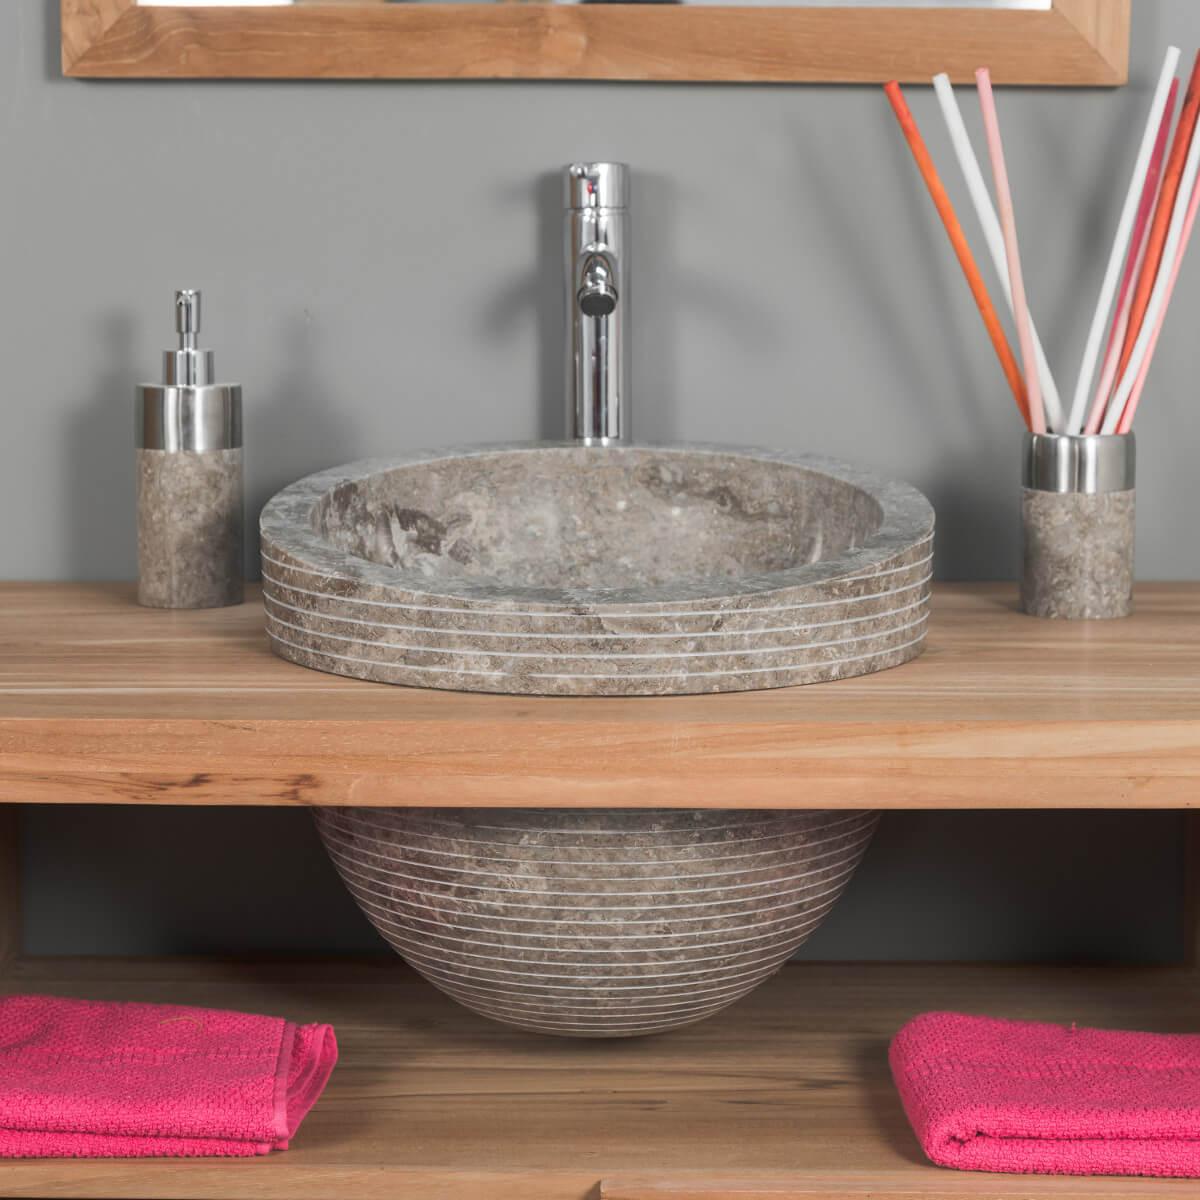 Lavabo ed n inclinado m rmol gris topo Eden del mueble